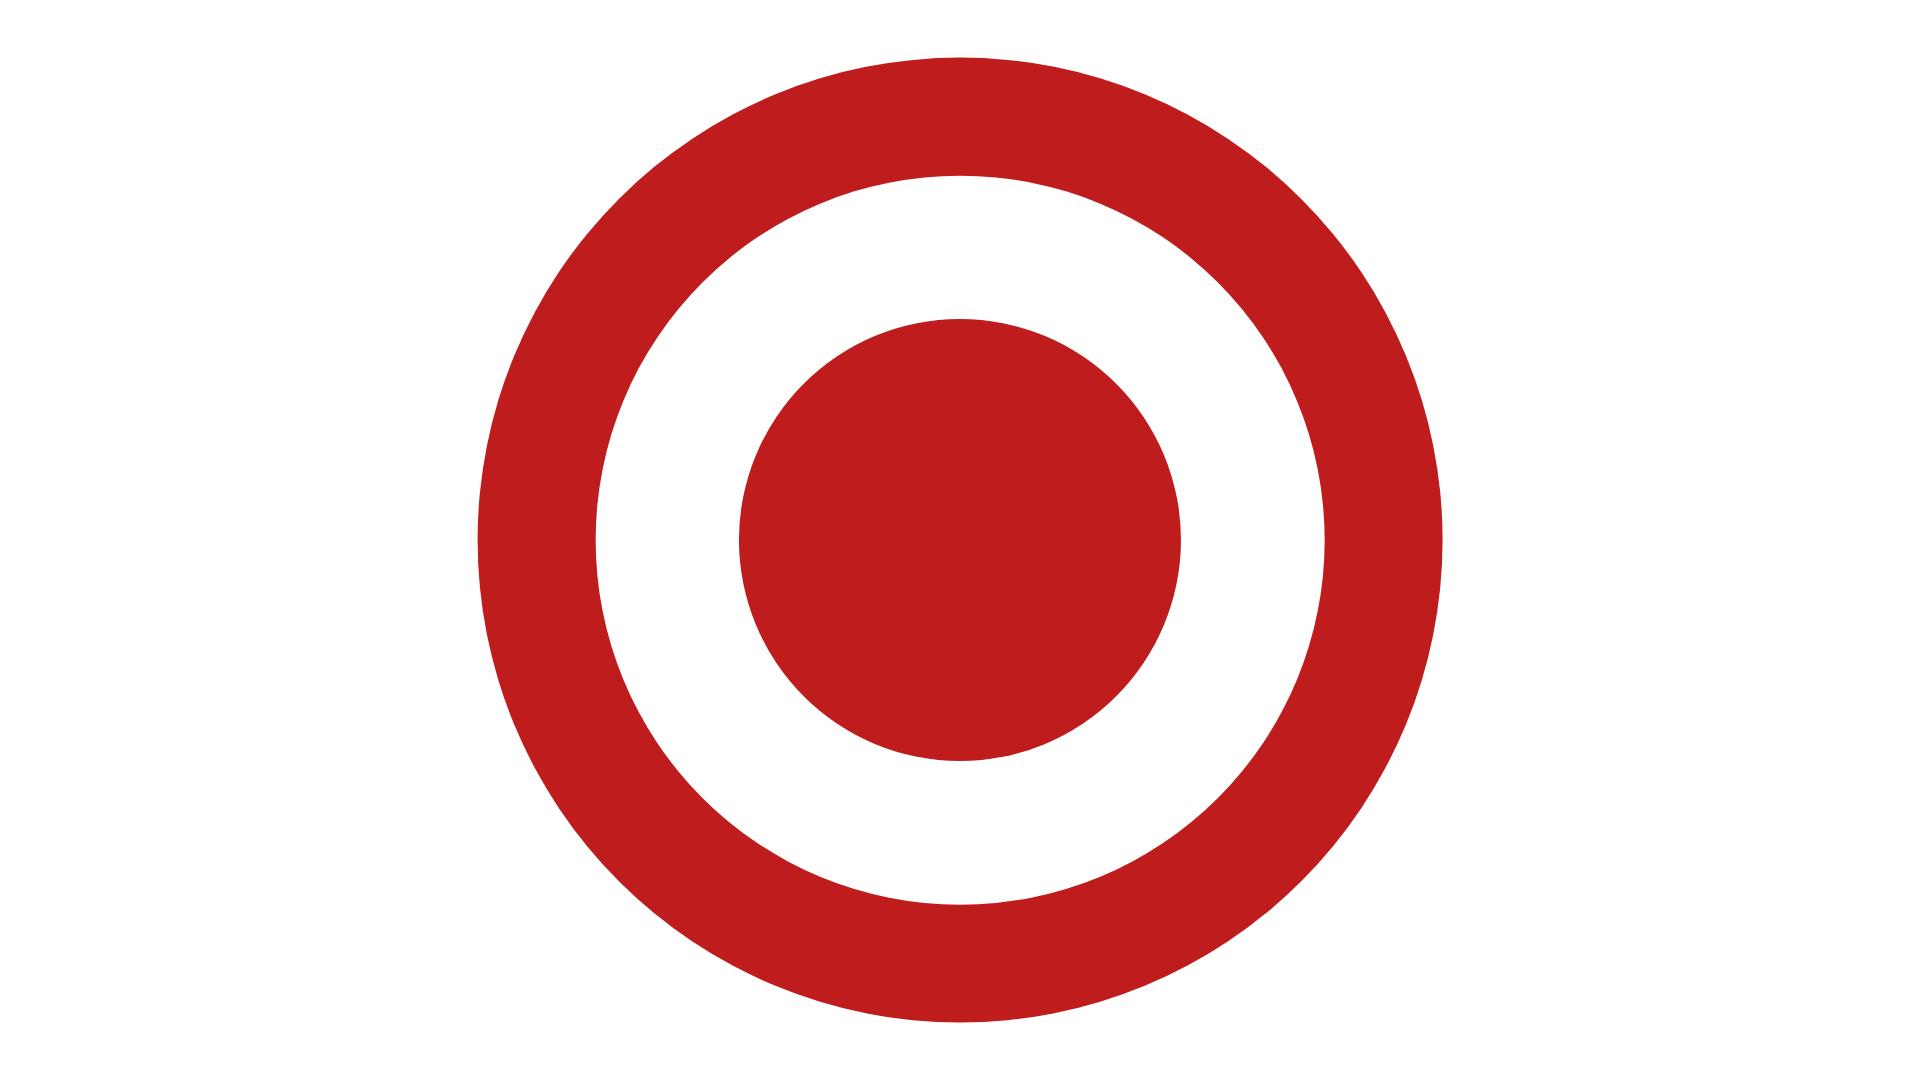 Do You Shop The Bullseye?